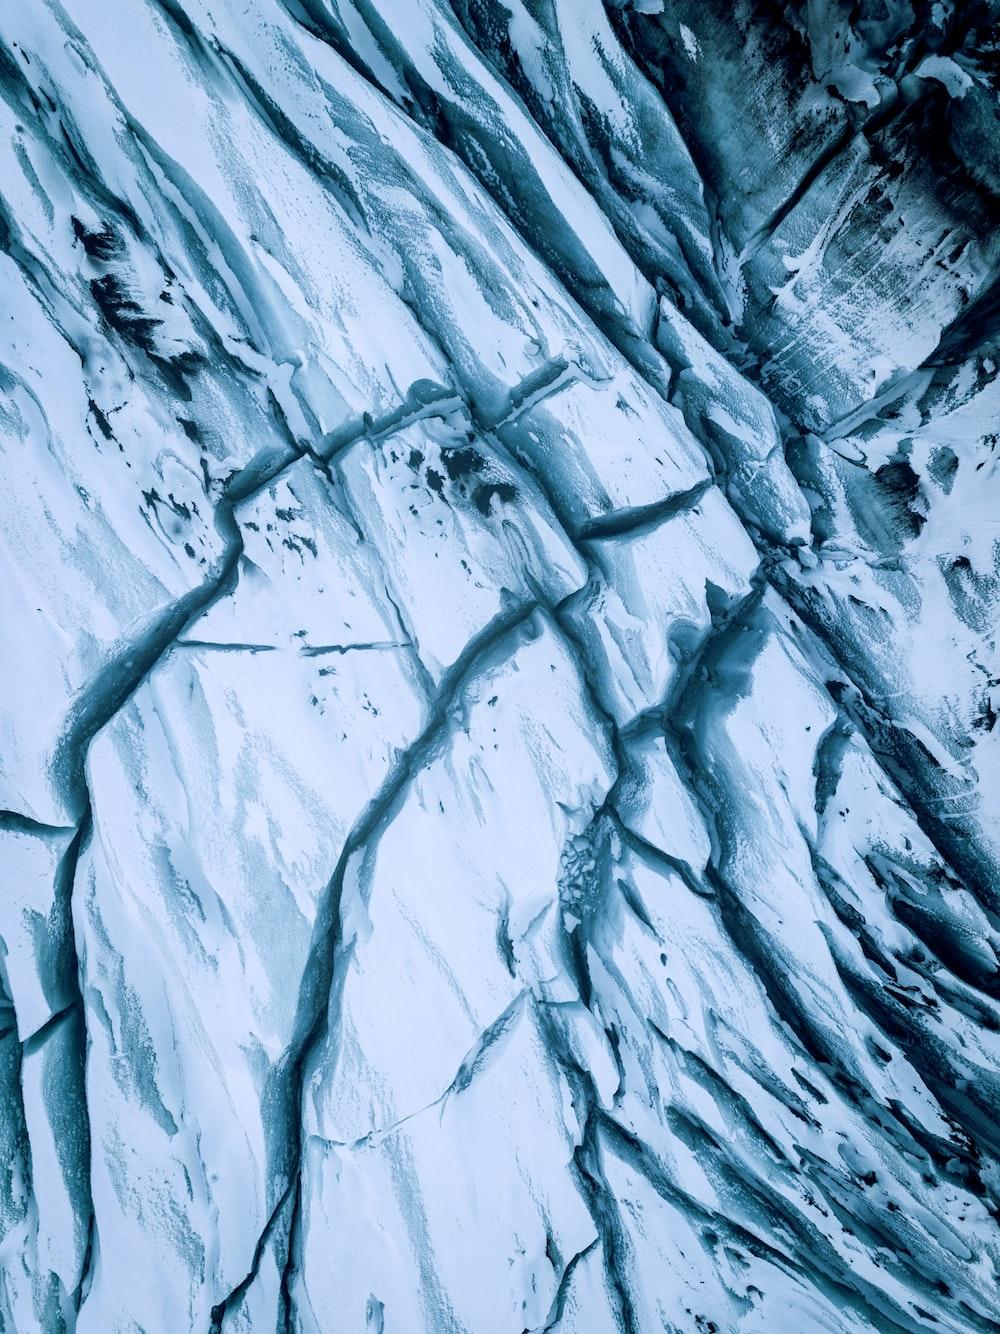 cracked rock formation illustration